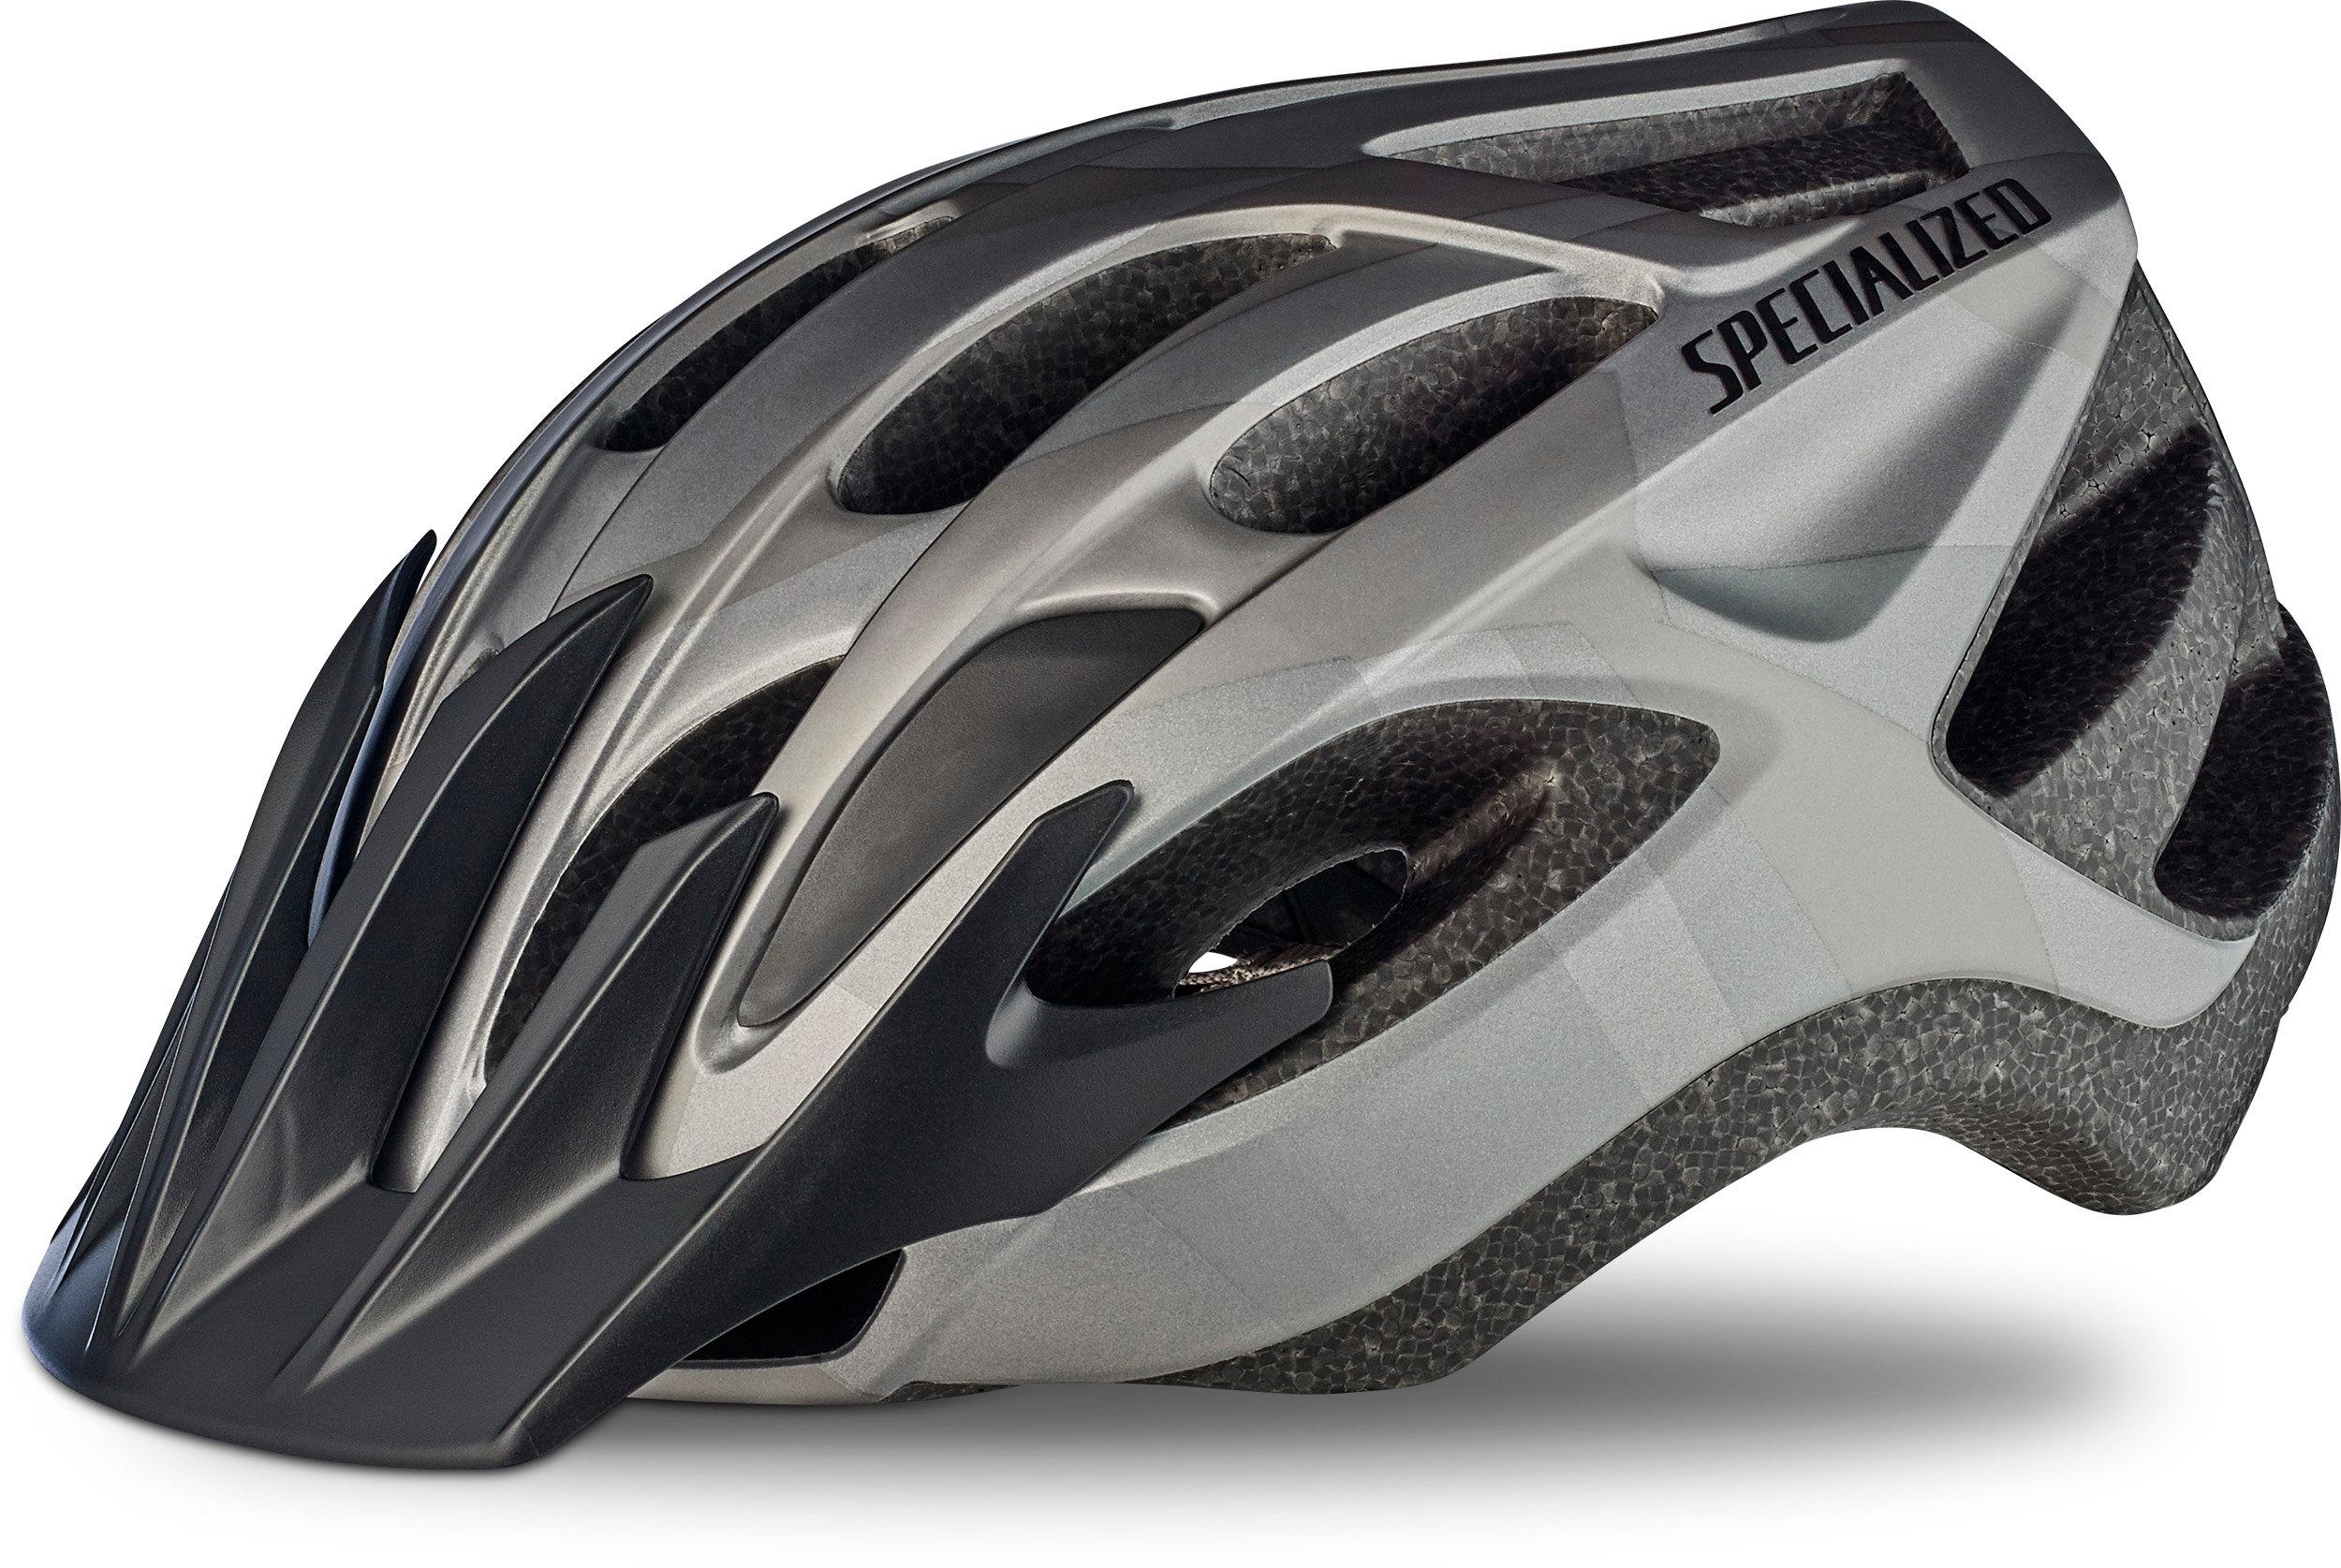 Specialized Align Matte Titanium ADLT - Alpha Bikes